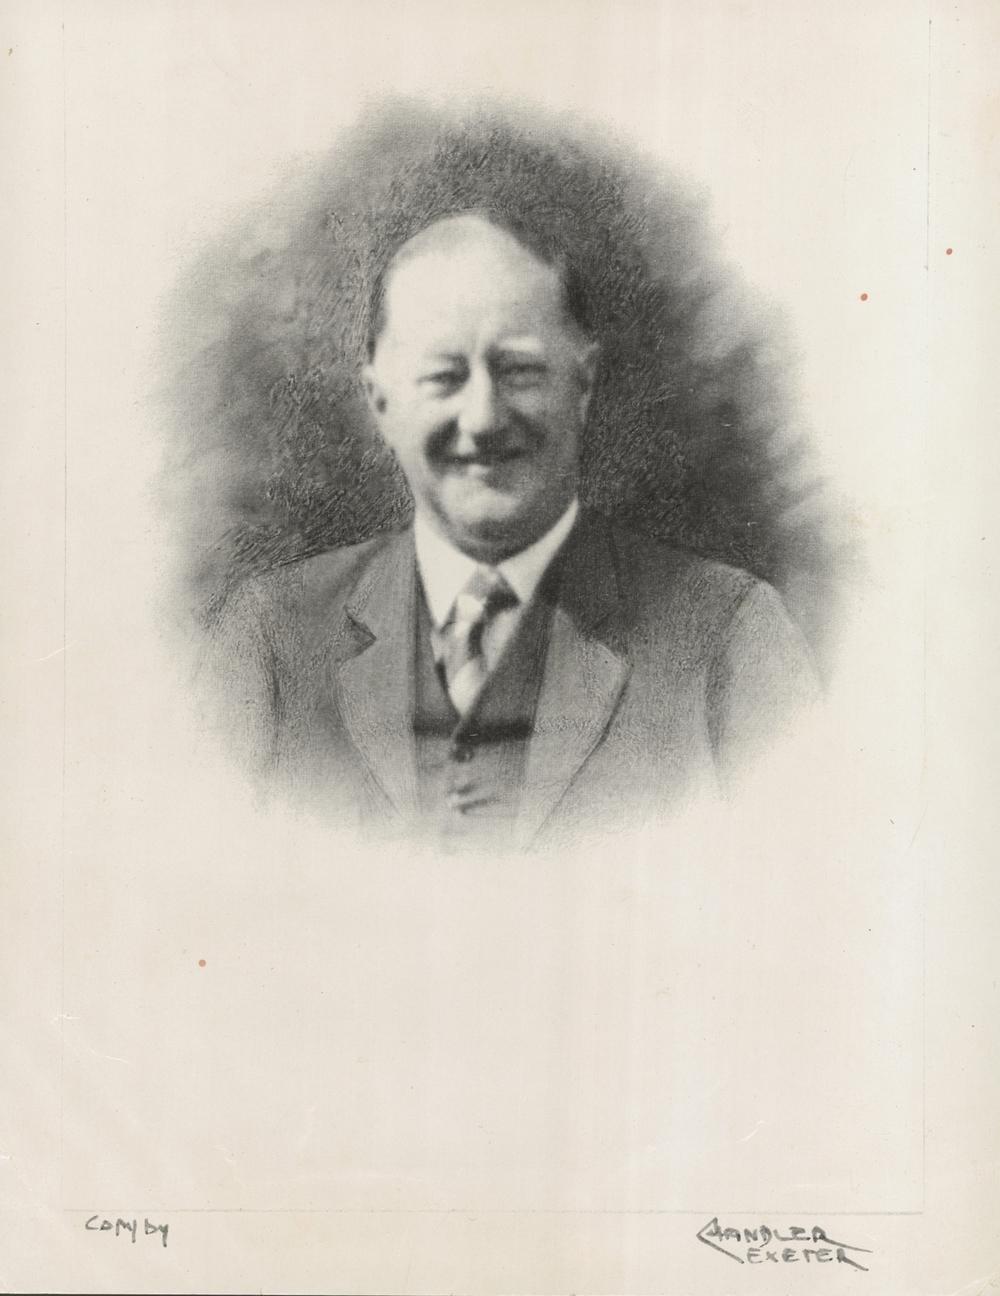 Frank Langdon